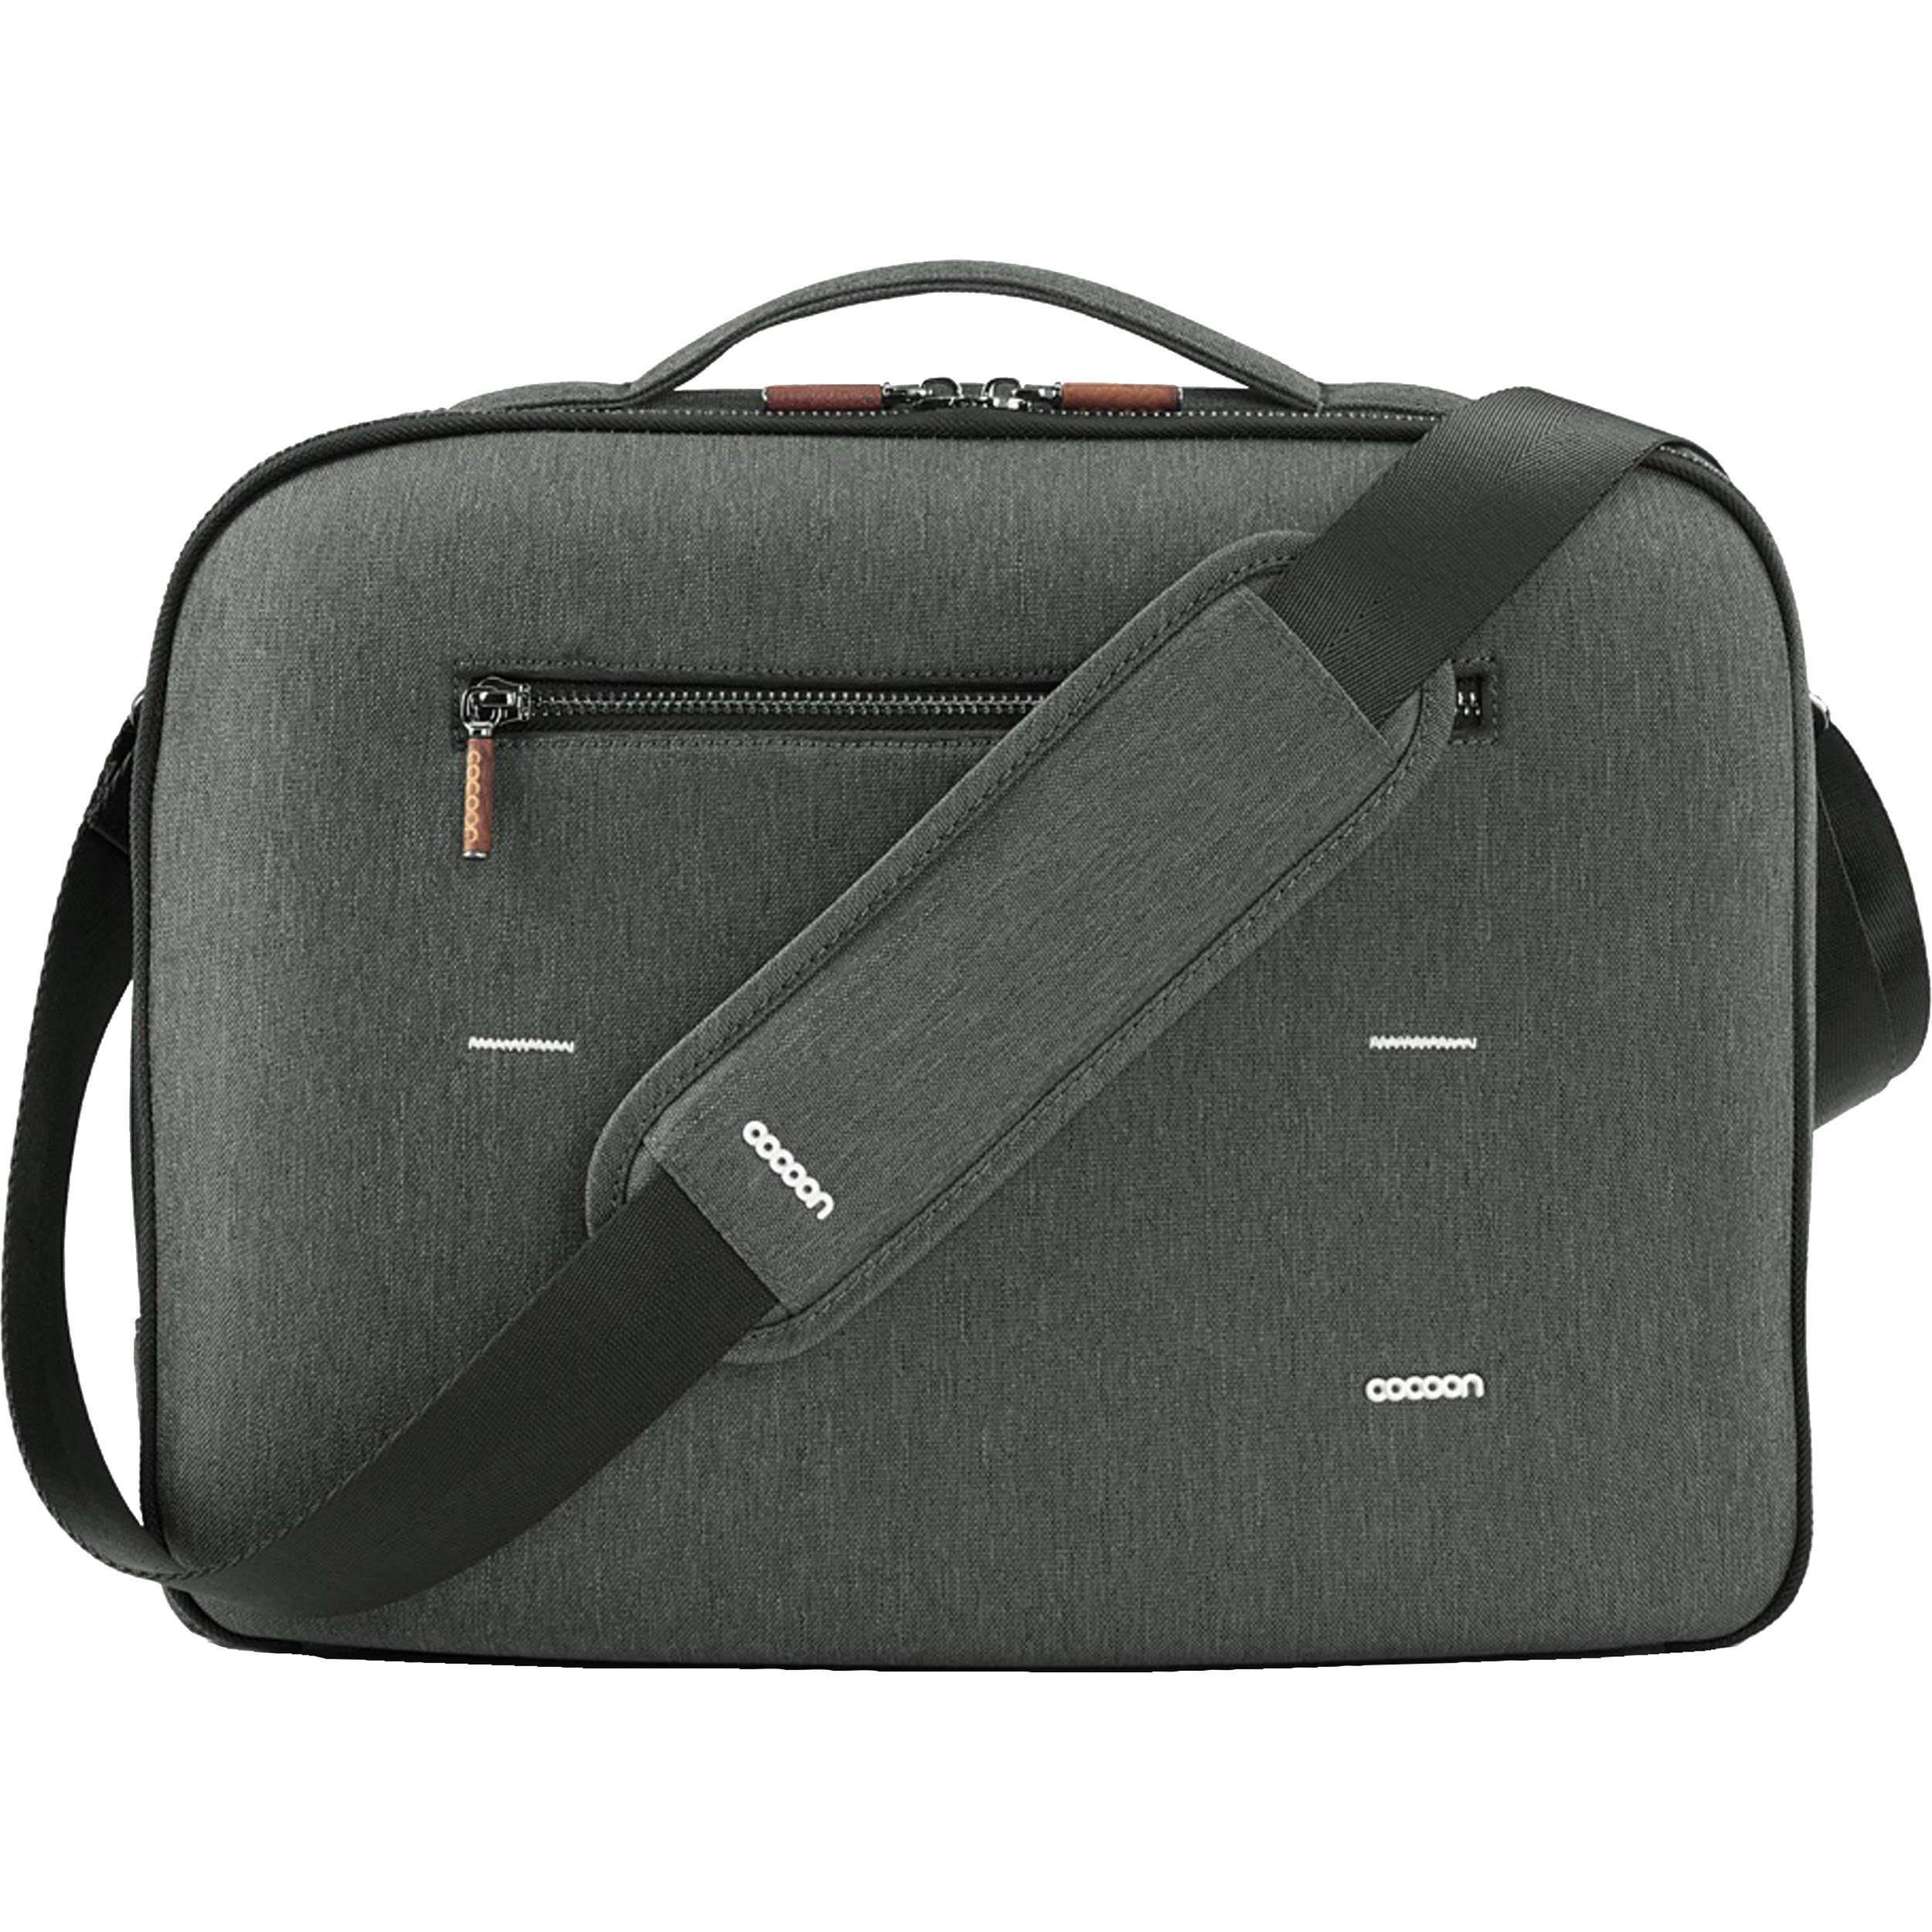 Co Graphite Brief 15 Macbook Pro Laptop Bag With Grid It